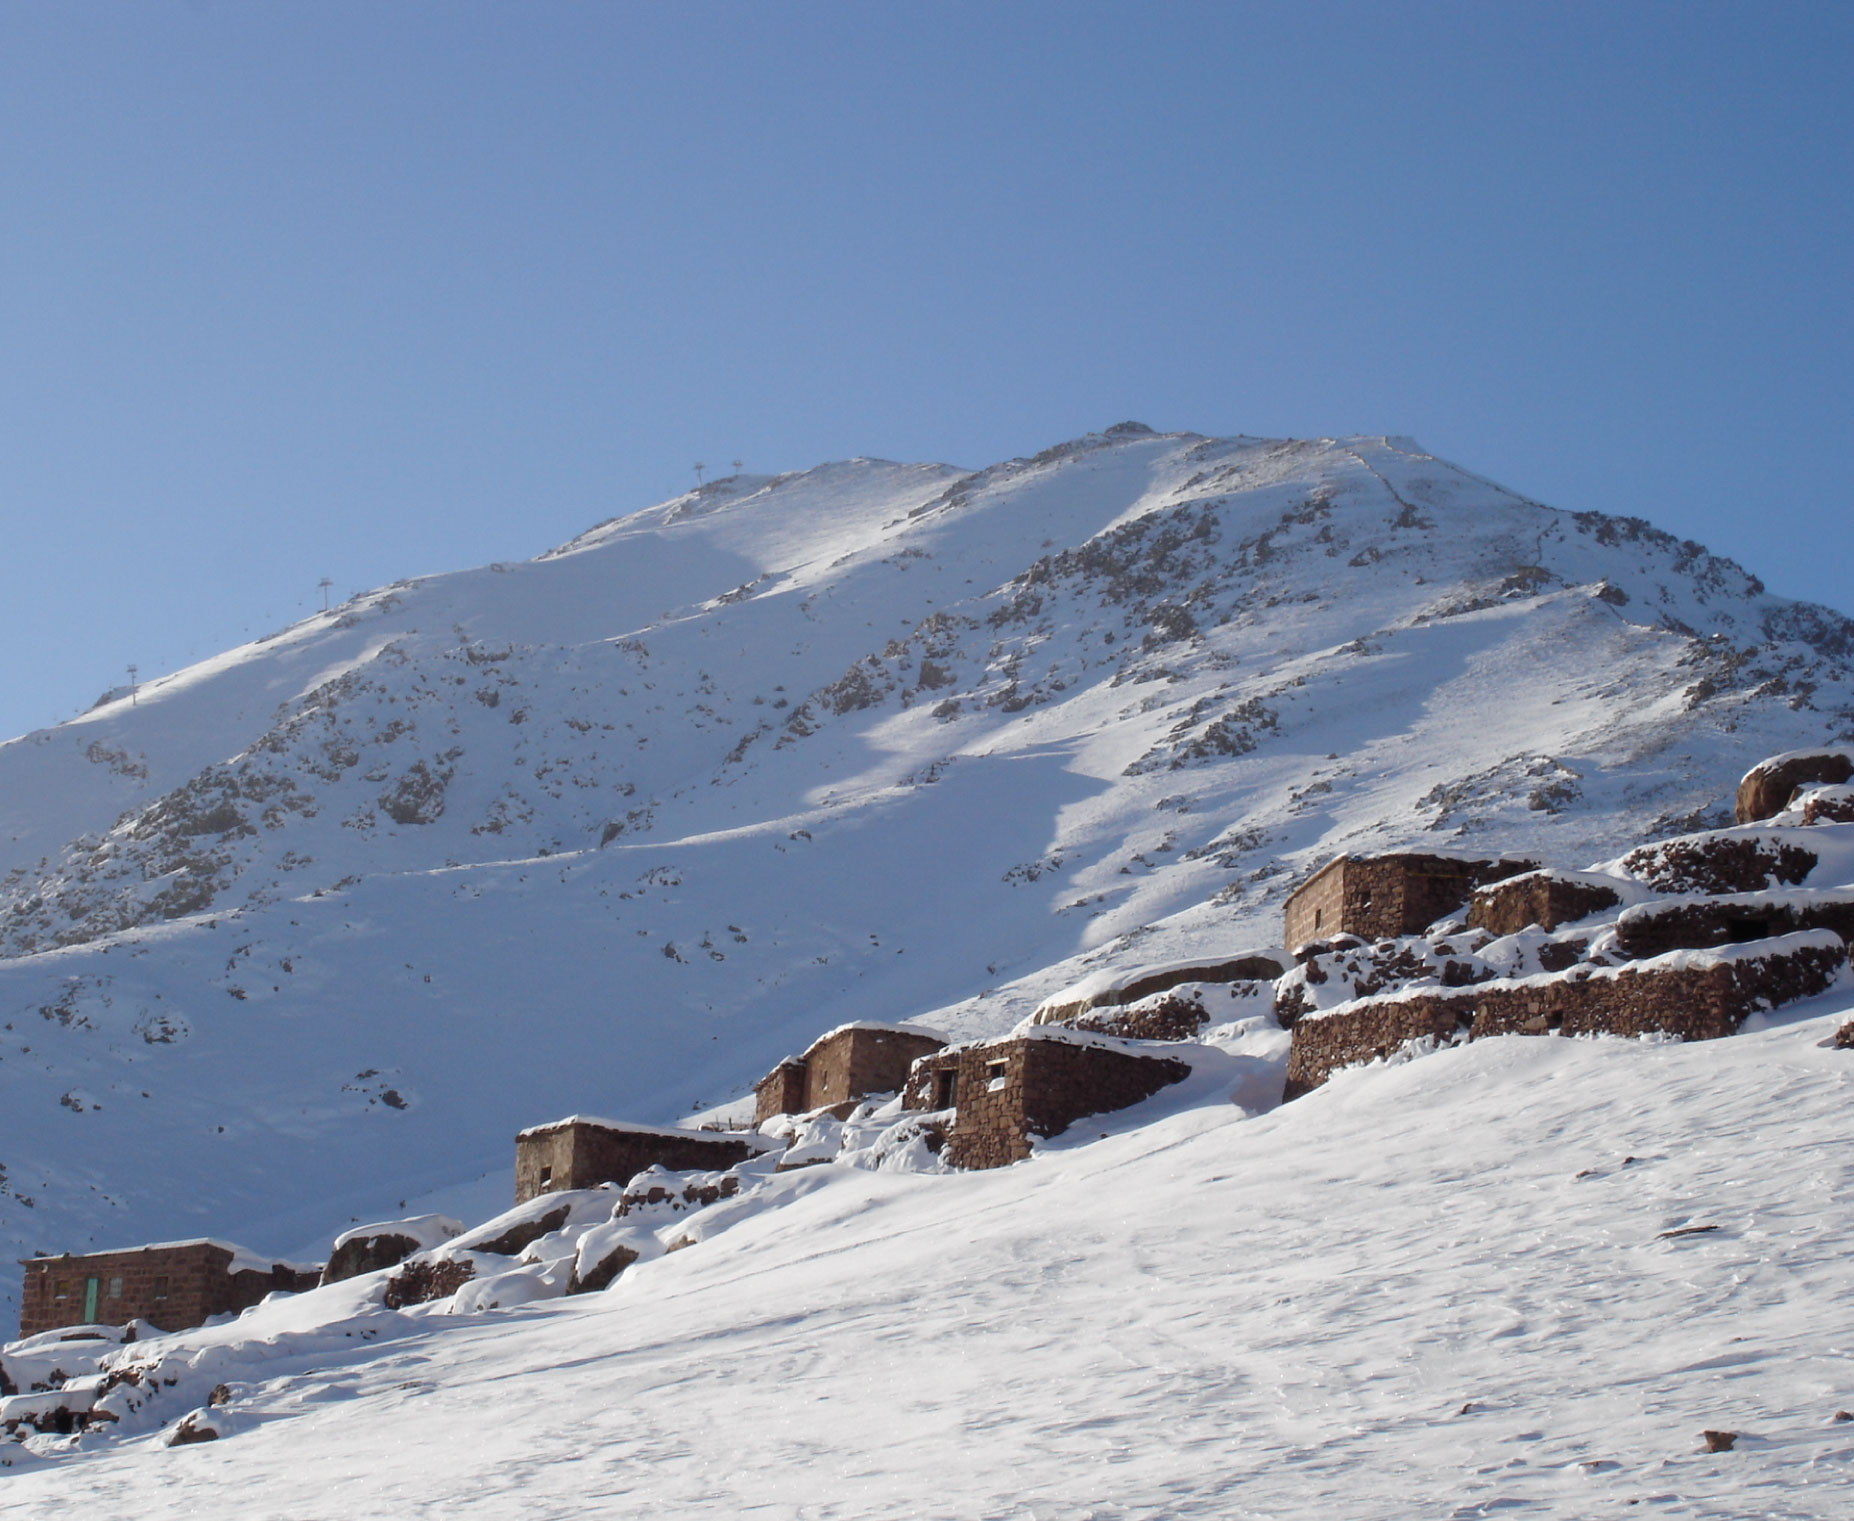 Winter on Site